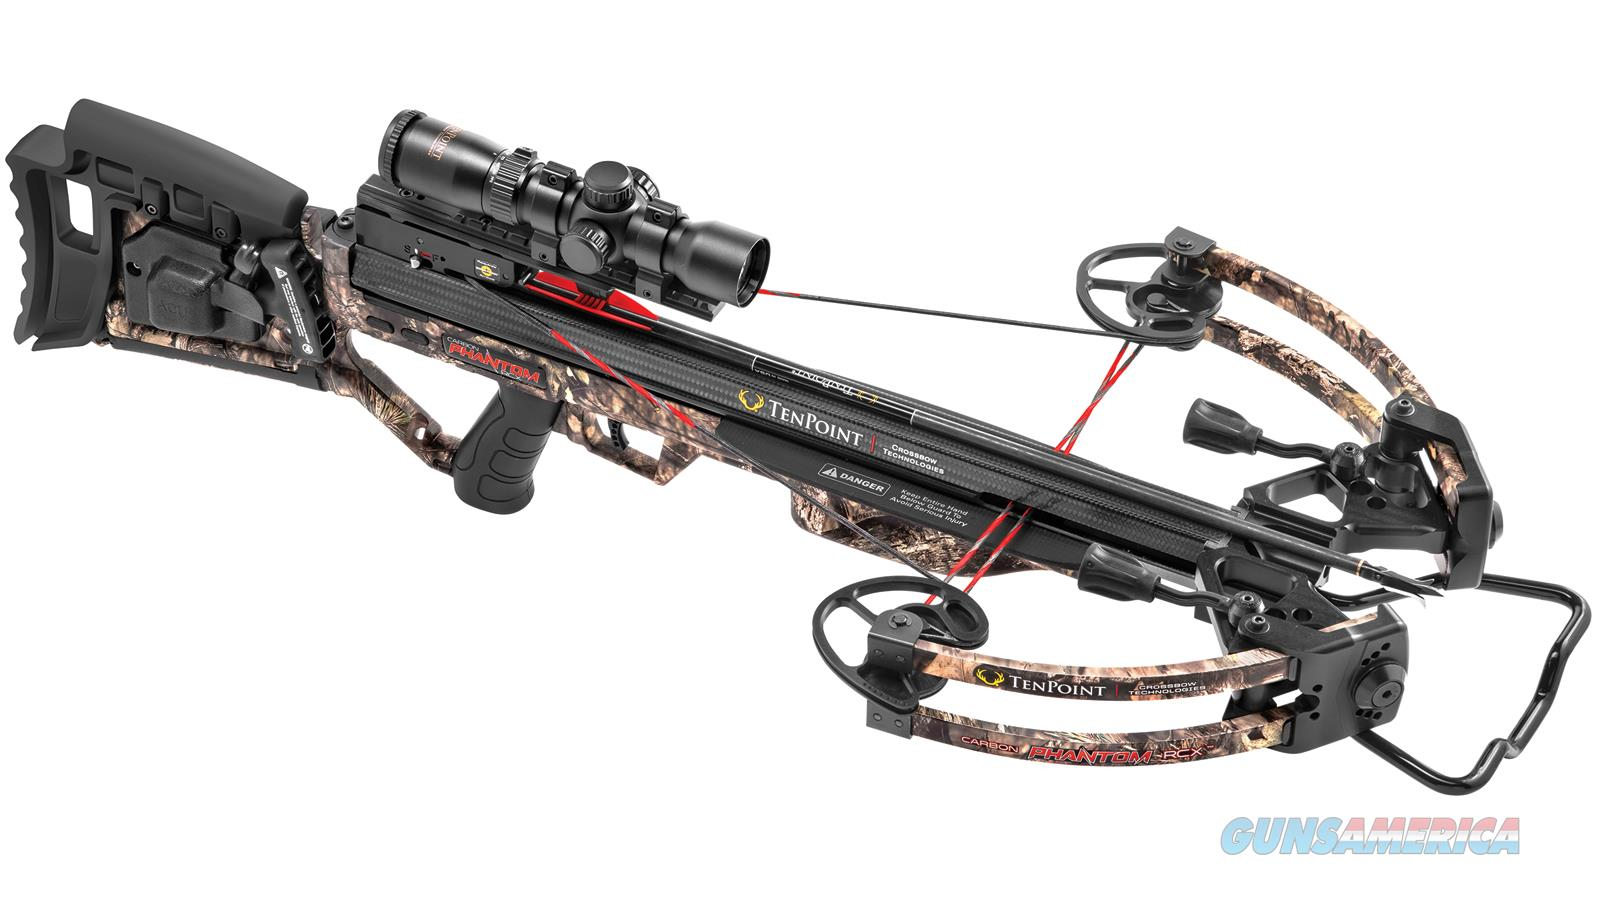 Ten Point Carbon Phantom Rcx Package CB170035111  Non-Guns > Archery > Parts